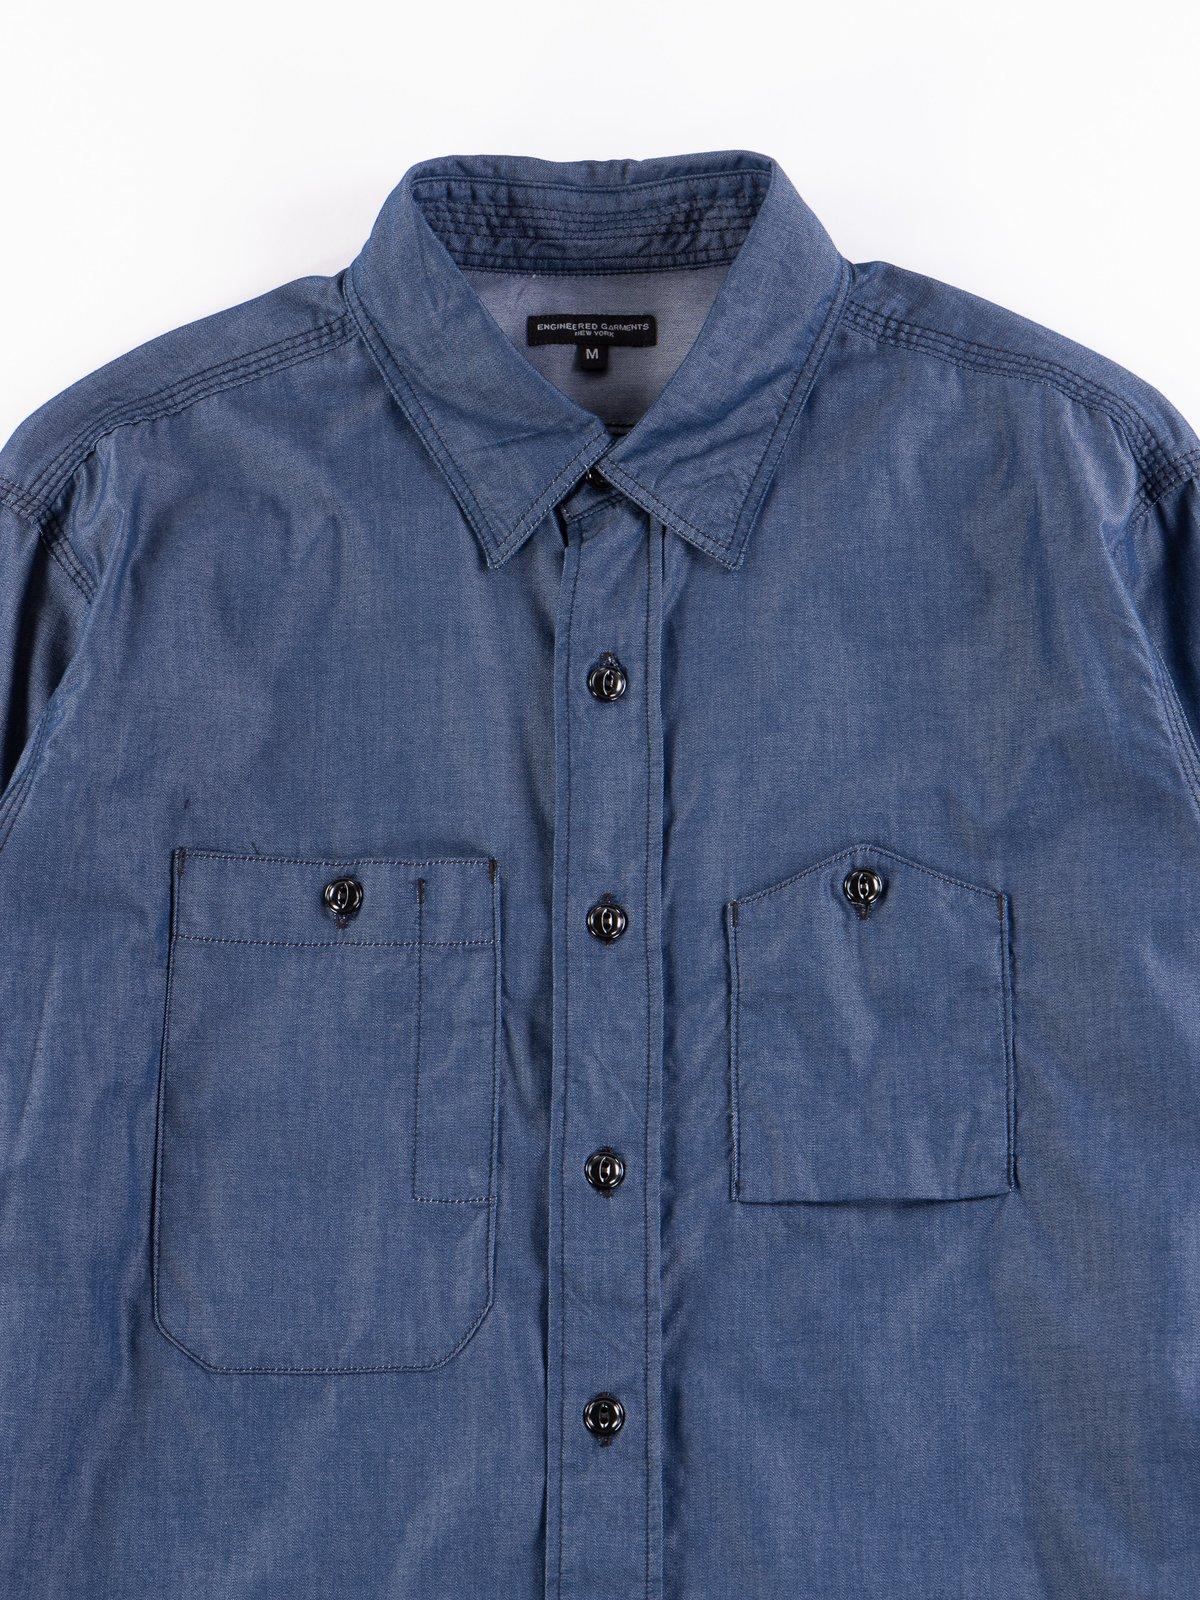 Dark Blue Light Weight Denim Work Shirt - Image 3